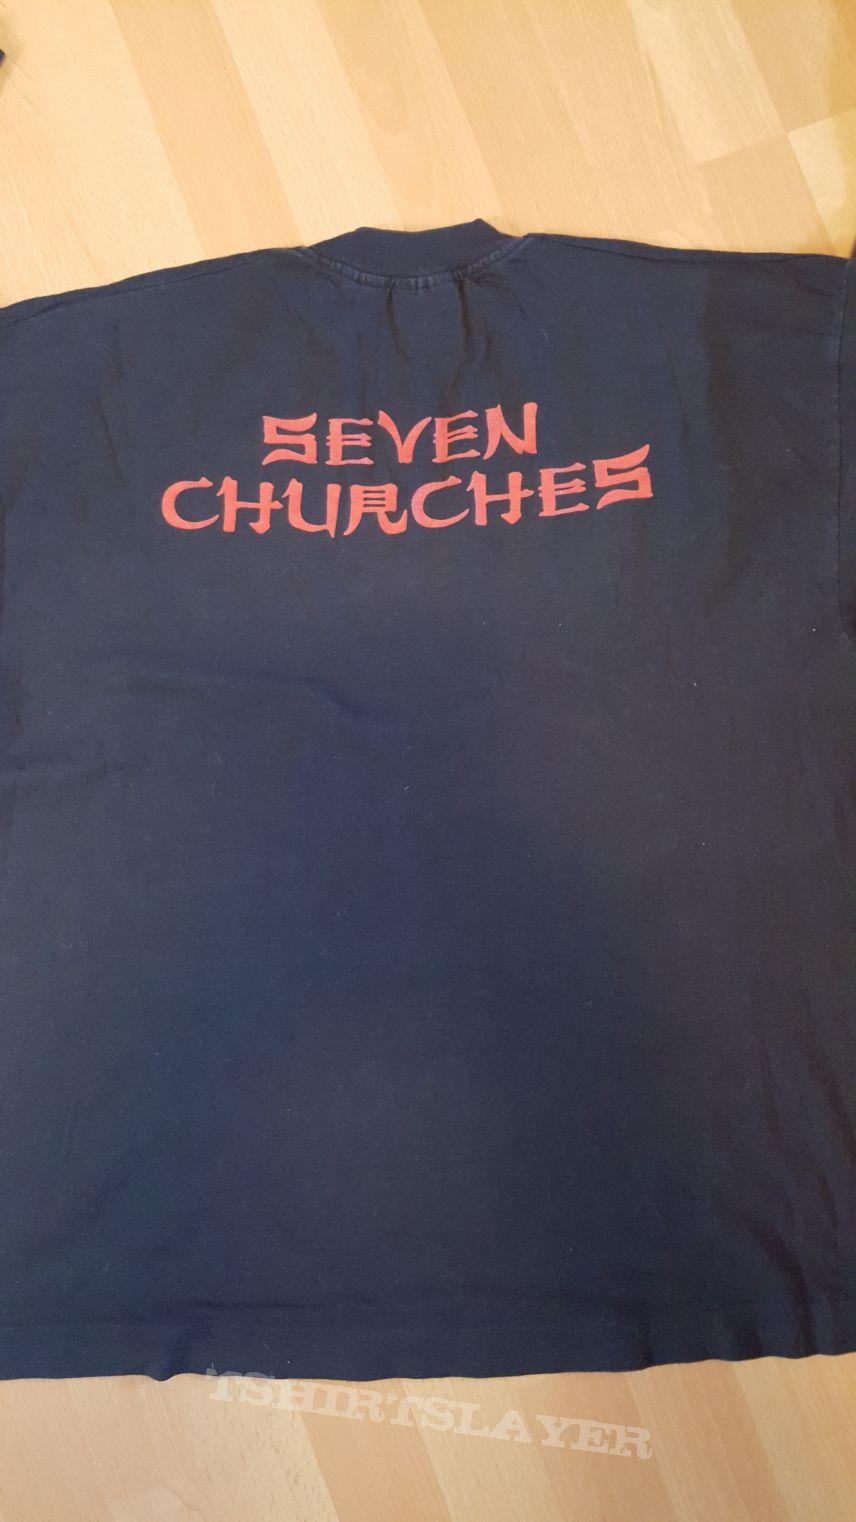 Possessed - Seven Churches LS